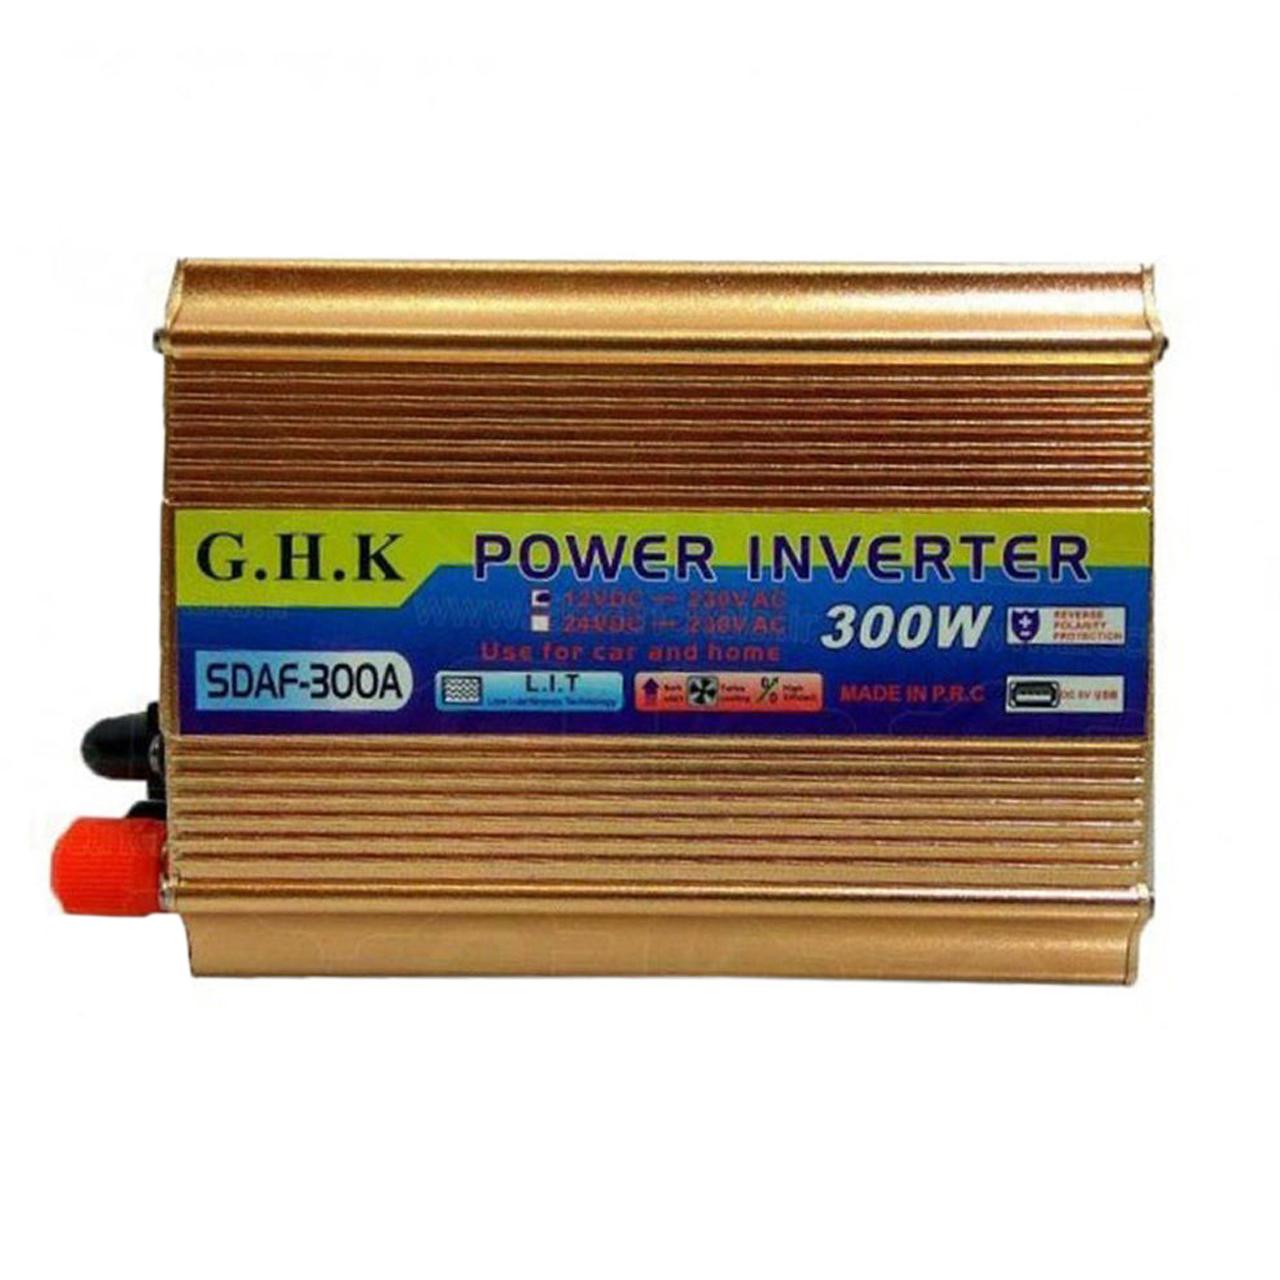 مبدل برق جی اچ کا مدل SDAF-300A ظرفیت 300 وات